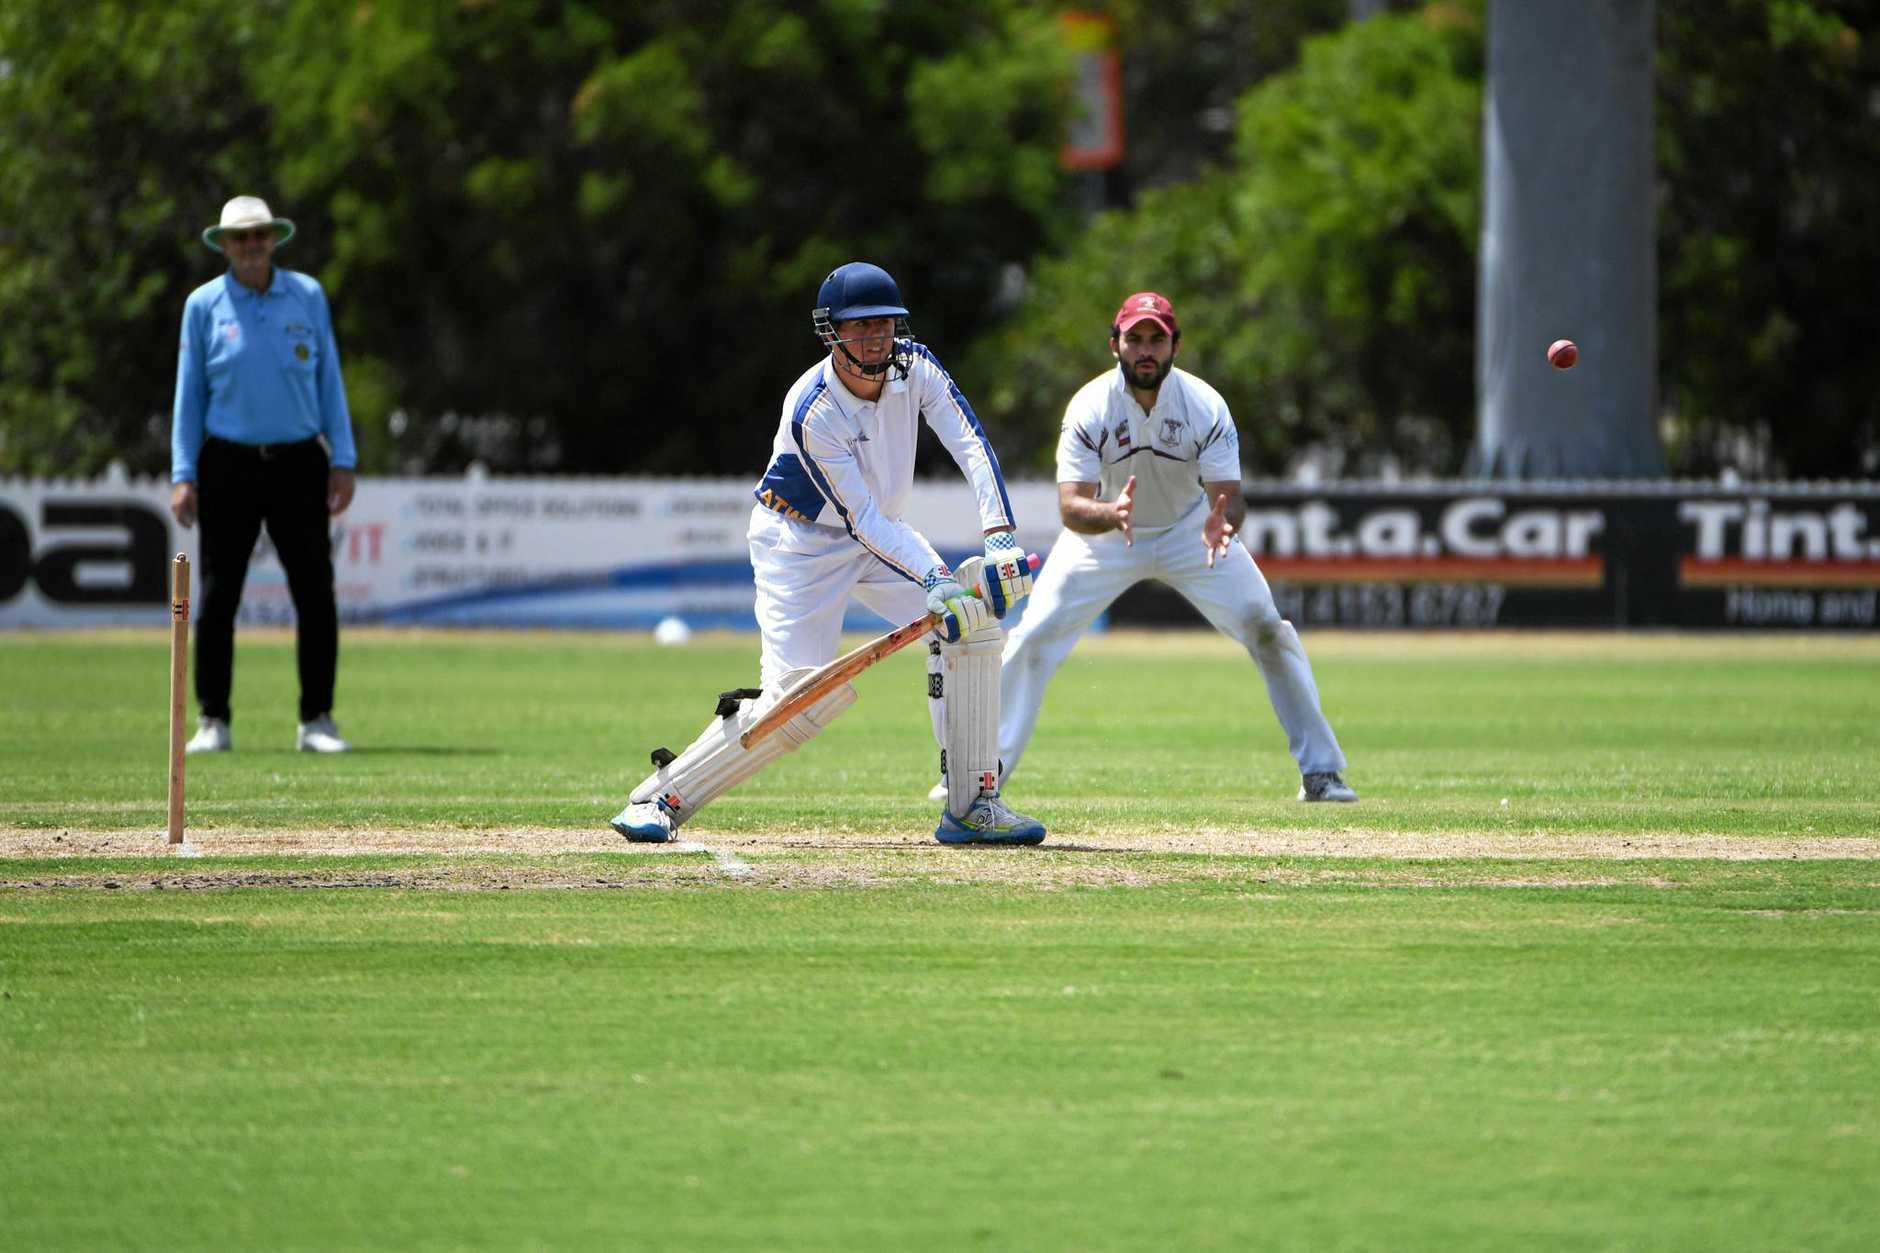 CRICKET GRAND FINAL: The Waves batsman Brendan Schultz faces a ball at Salter Oval.